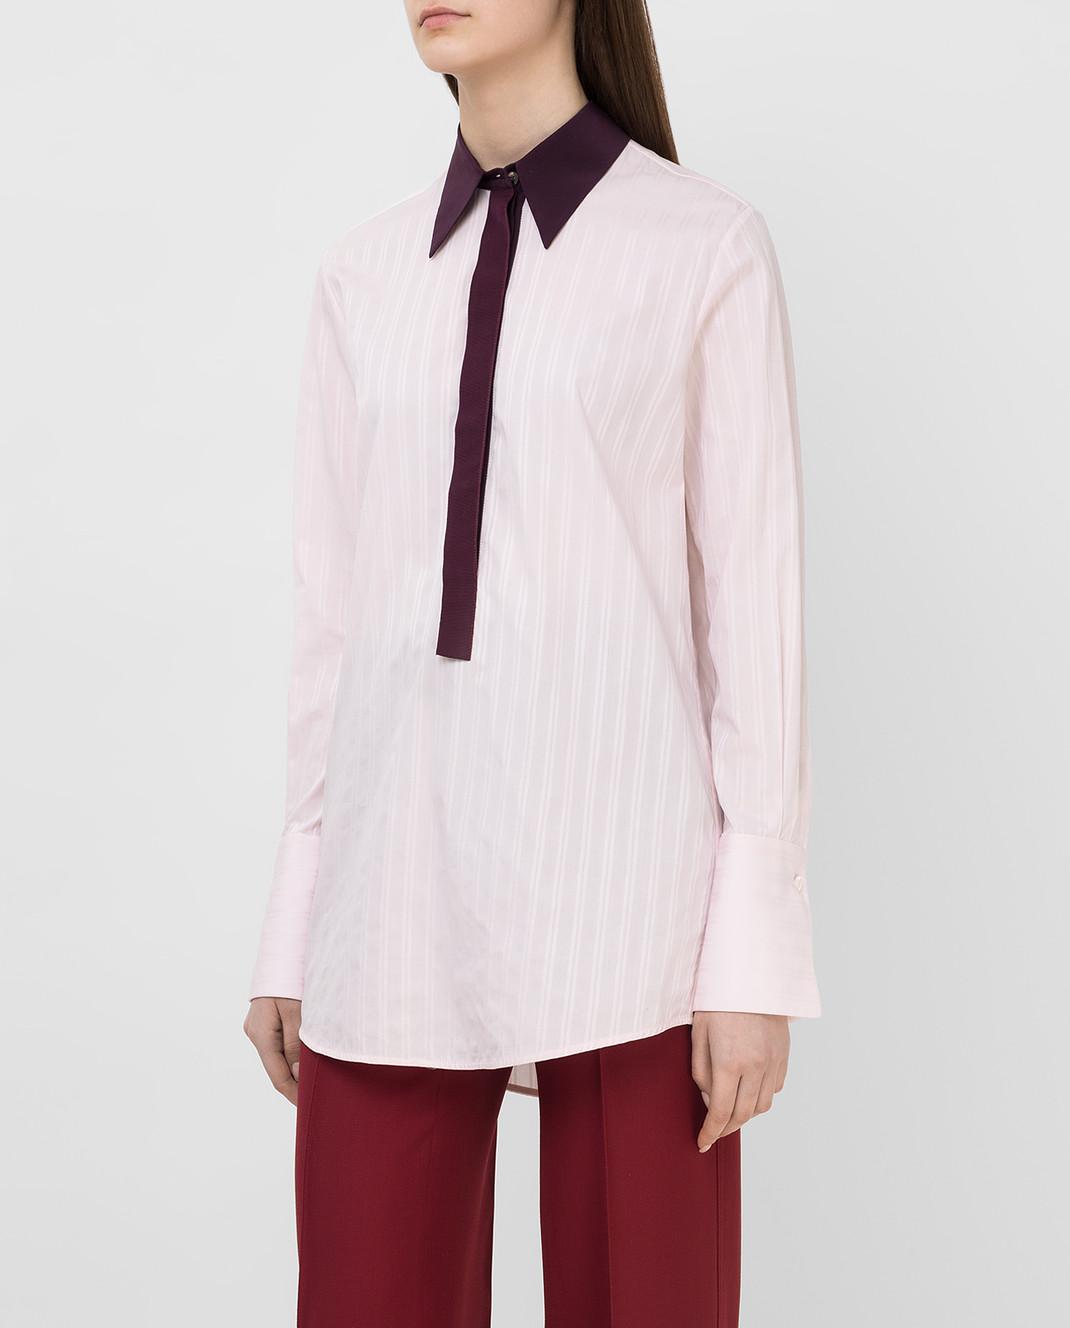 Victoria by Victoria Beckham Розовая рубашка SHVV117 изображение 3